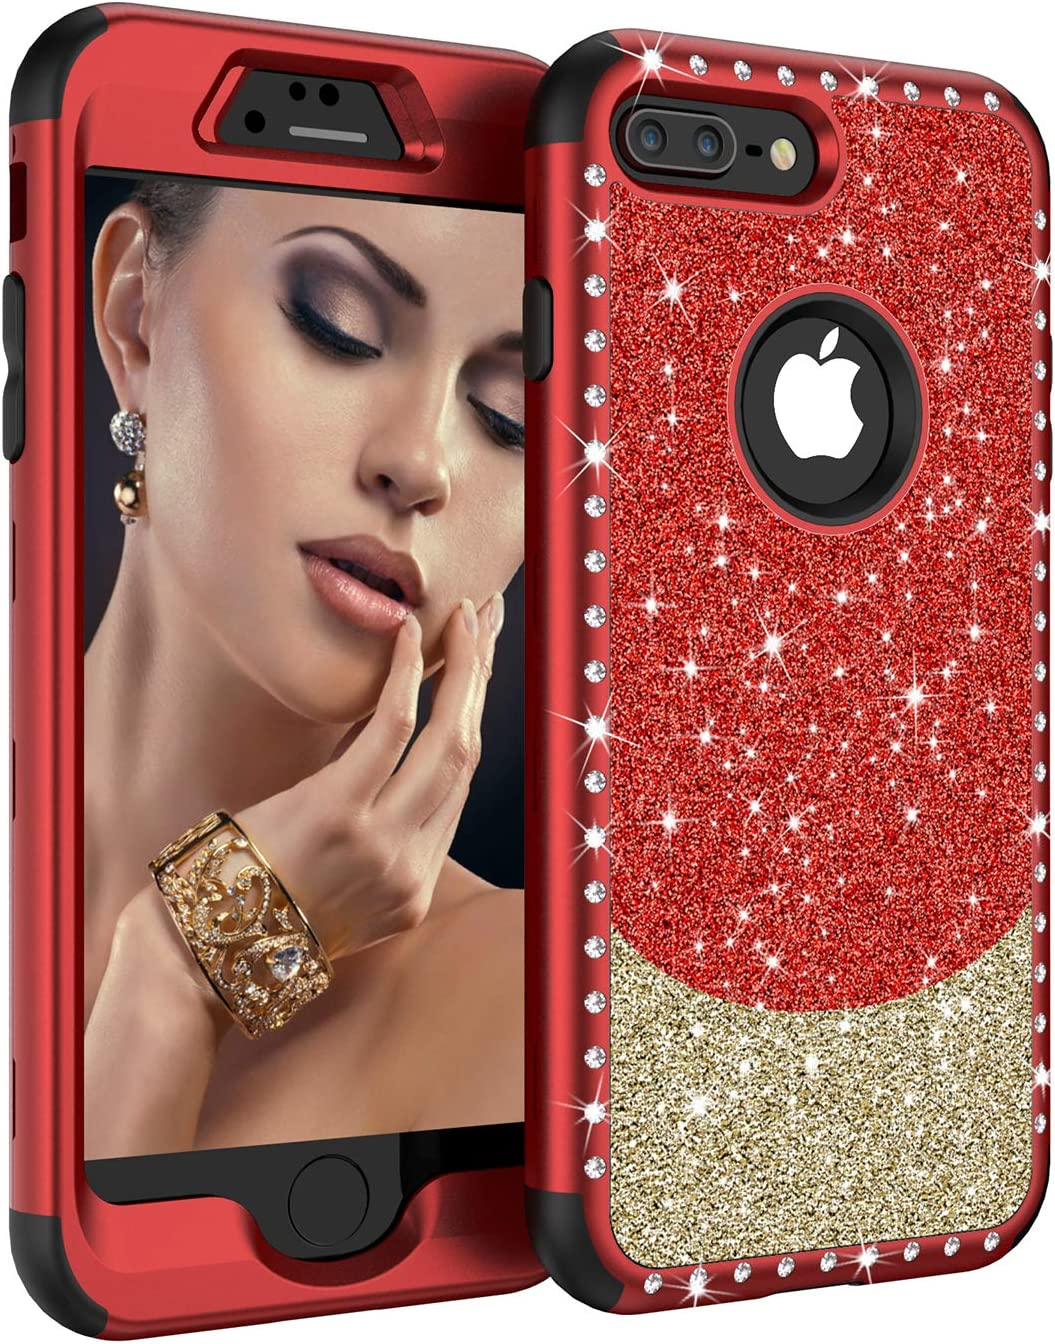 "iPhone 8 Plus Case, iPhone 7 Plus Case,UZER Three Layer Shockproof 3D Handmade Luxury Beauty Crystal Rhinestone Glitter Sparkle Bling Diamond Hard PC Soft Silicone Case for iPhone 8 Plus/7 Plus 5.5"""